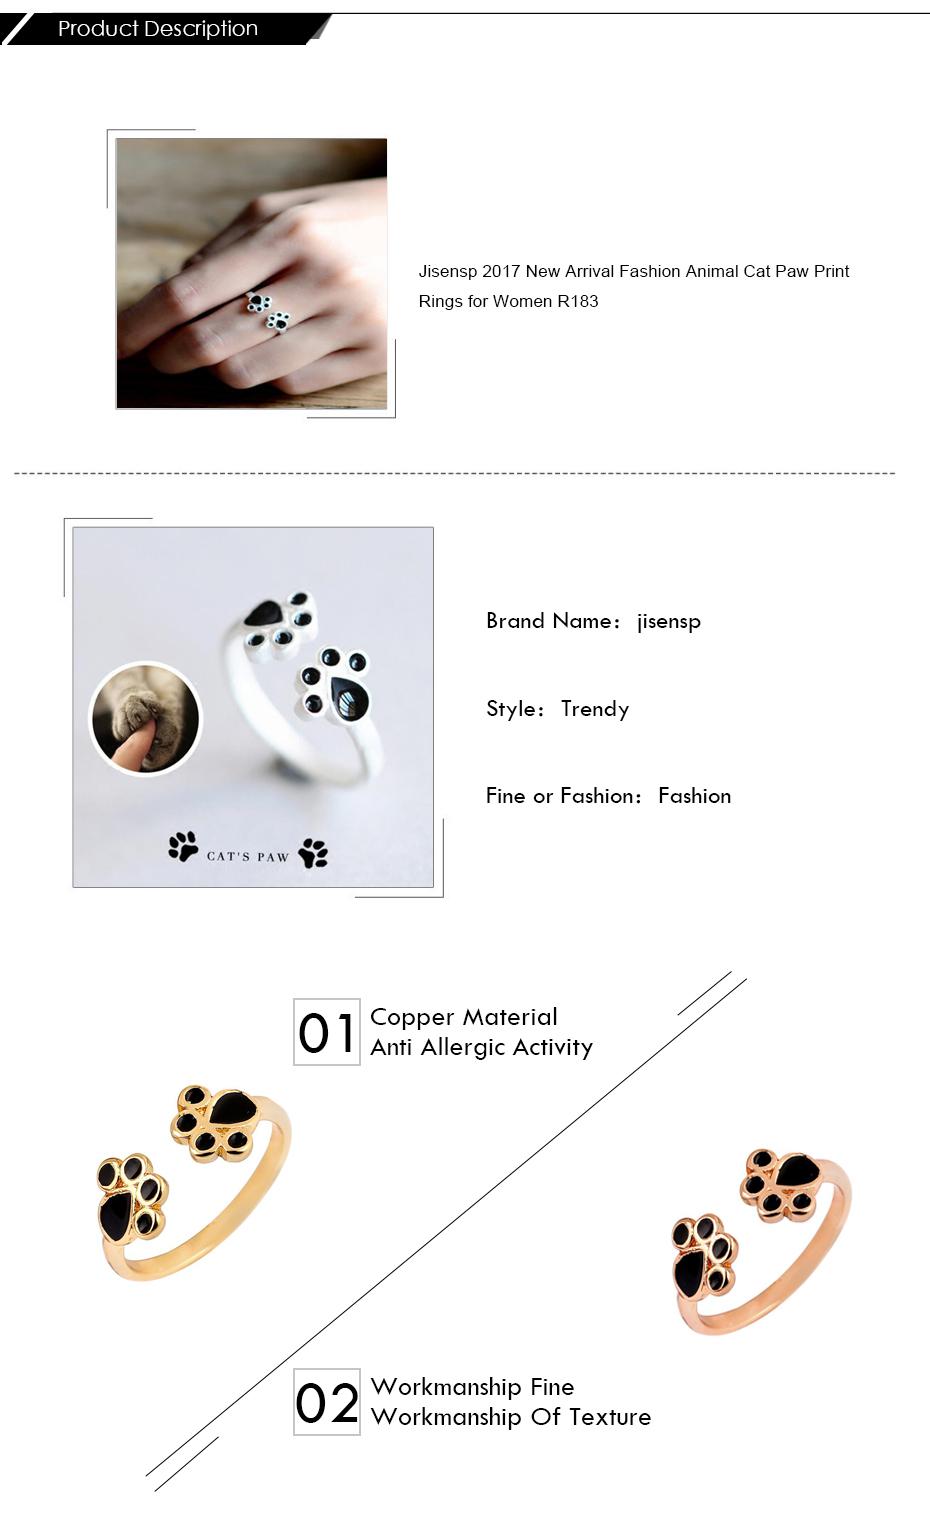 Fashion Animal Cat 1